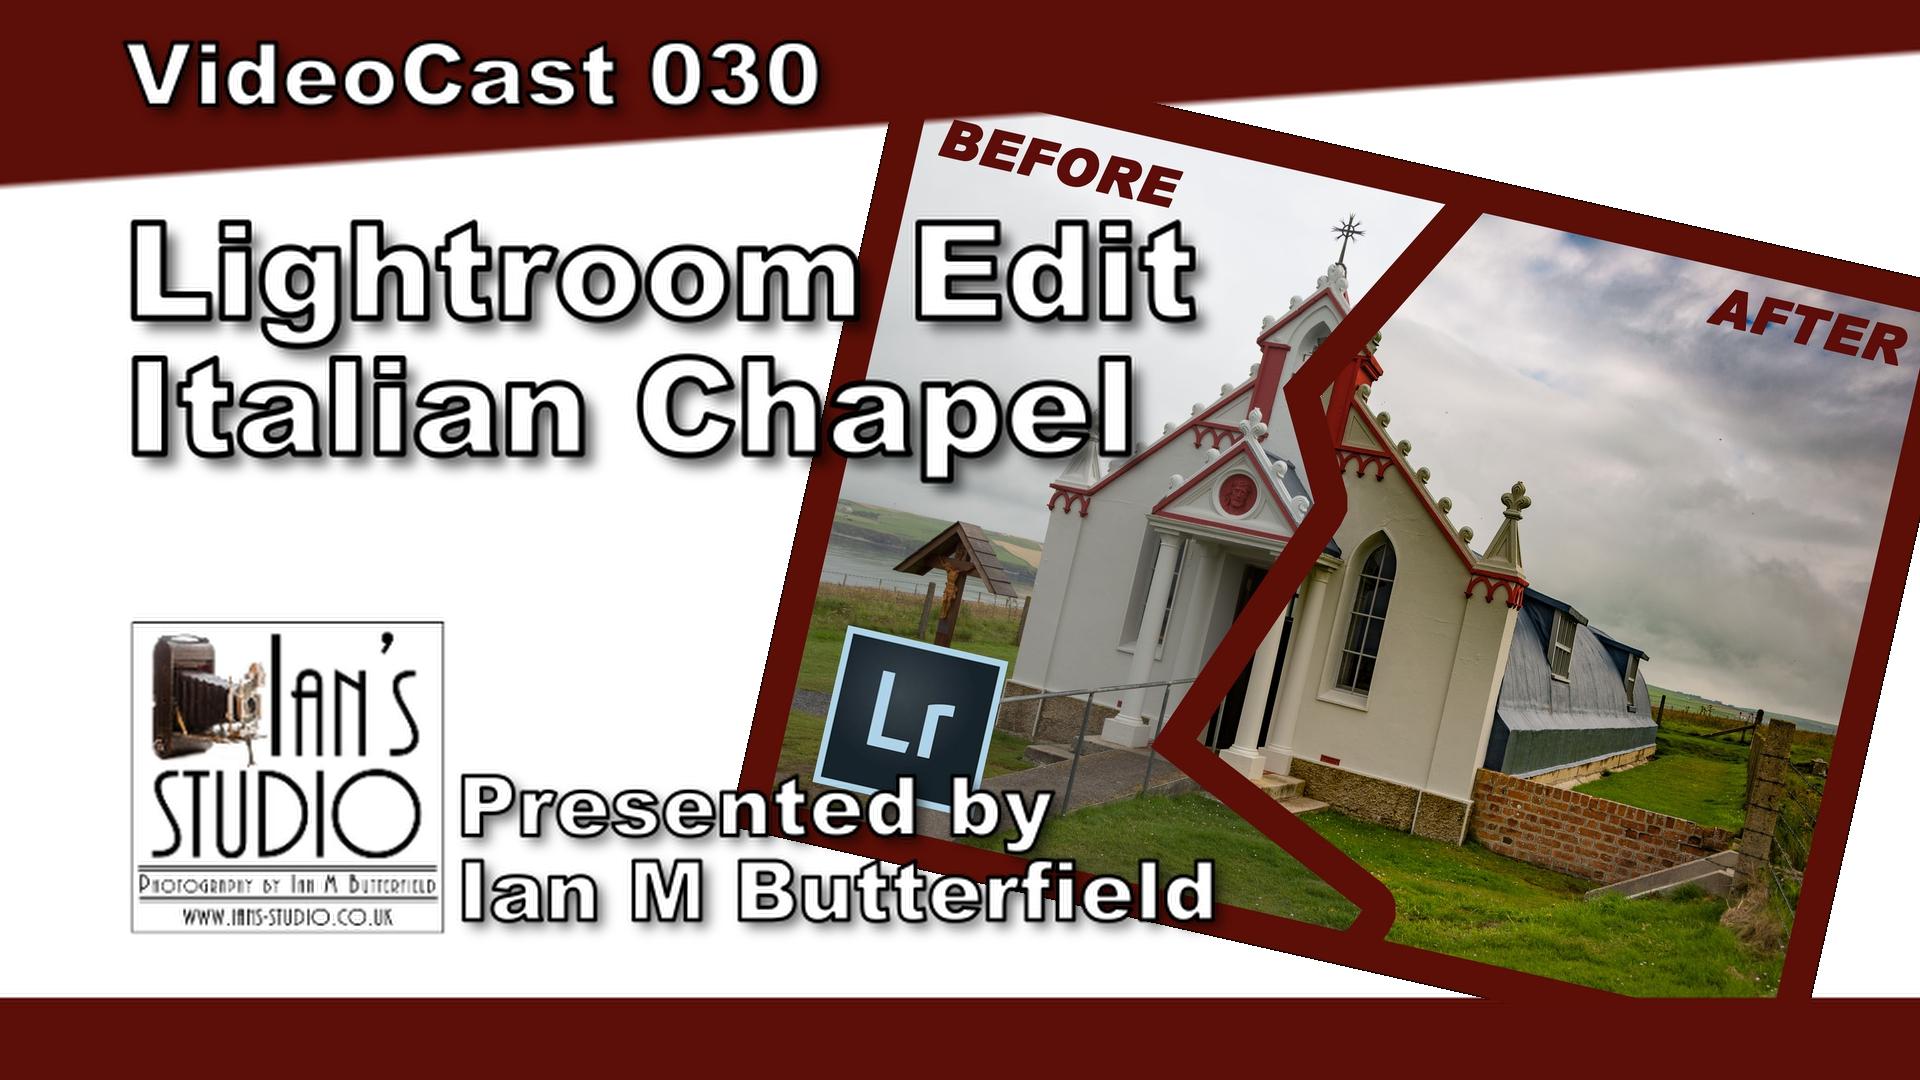 Lightroom Edit – The Italian Chapel, Kirkwall, Orkney  [VideoCast 030]